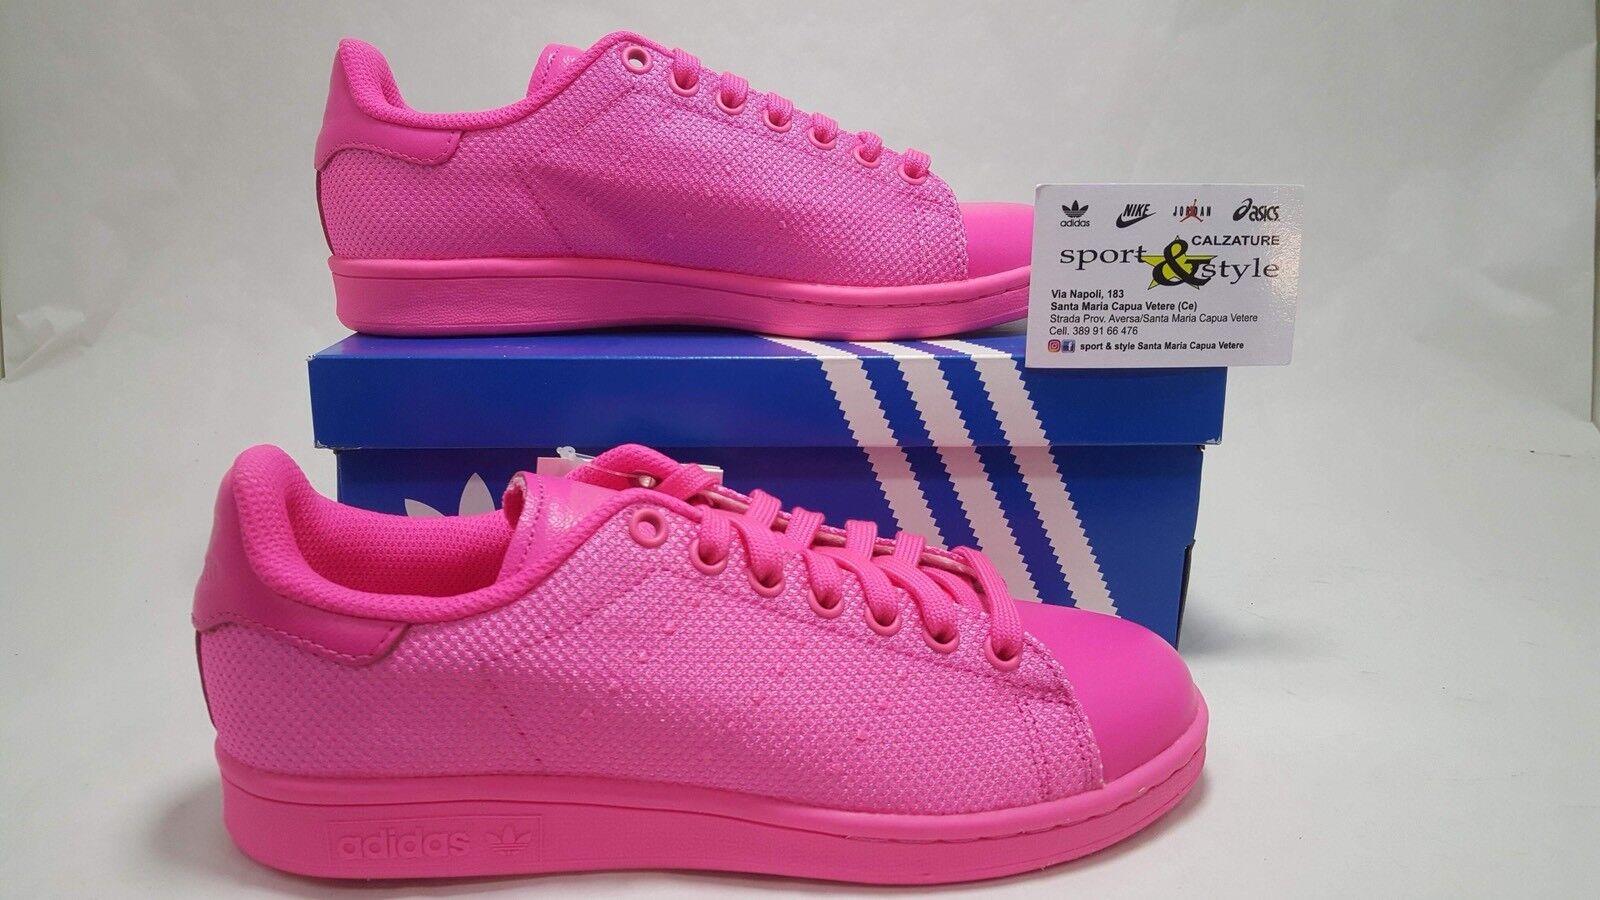 Zapatos n 39 1 / 3 Adidas bb4997 Stan Smith zapatillas Basse bb4997 Adidas gran descuento 149868